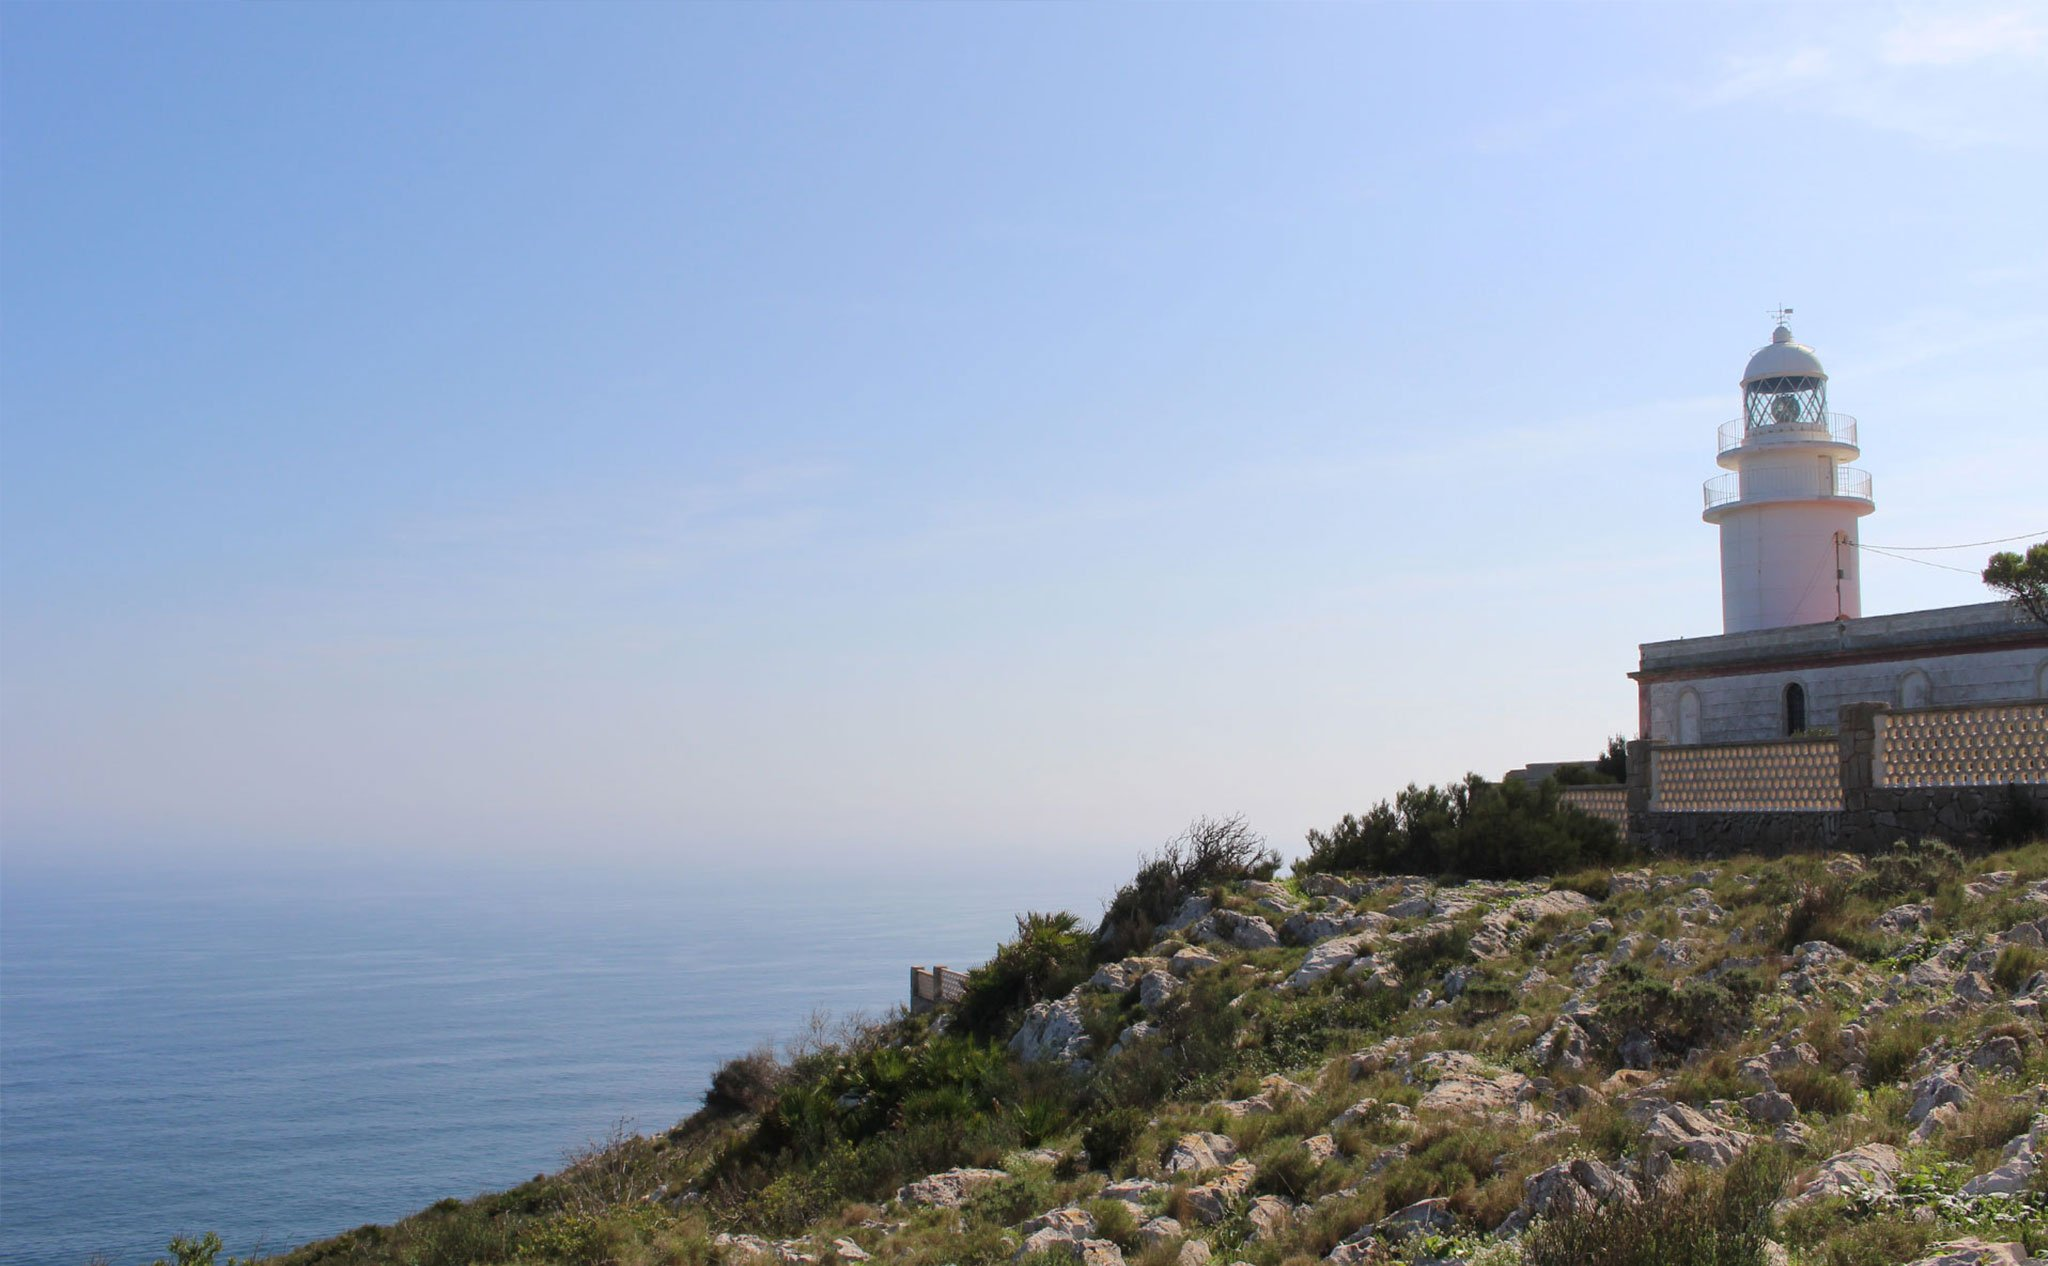 Vista del faro del Cap de Sant Antoni en Xàbia